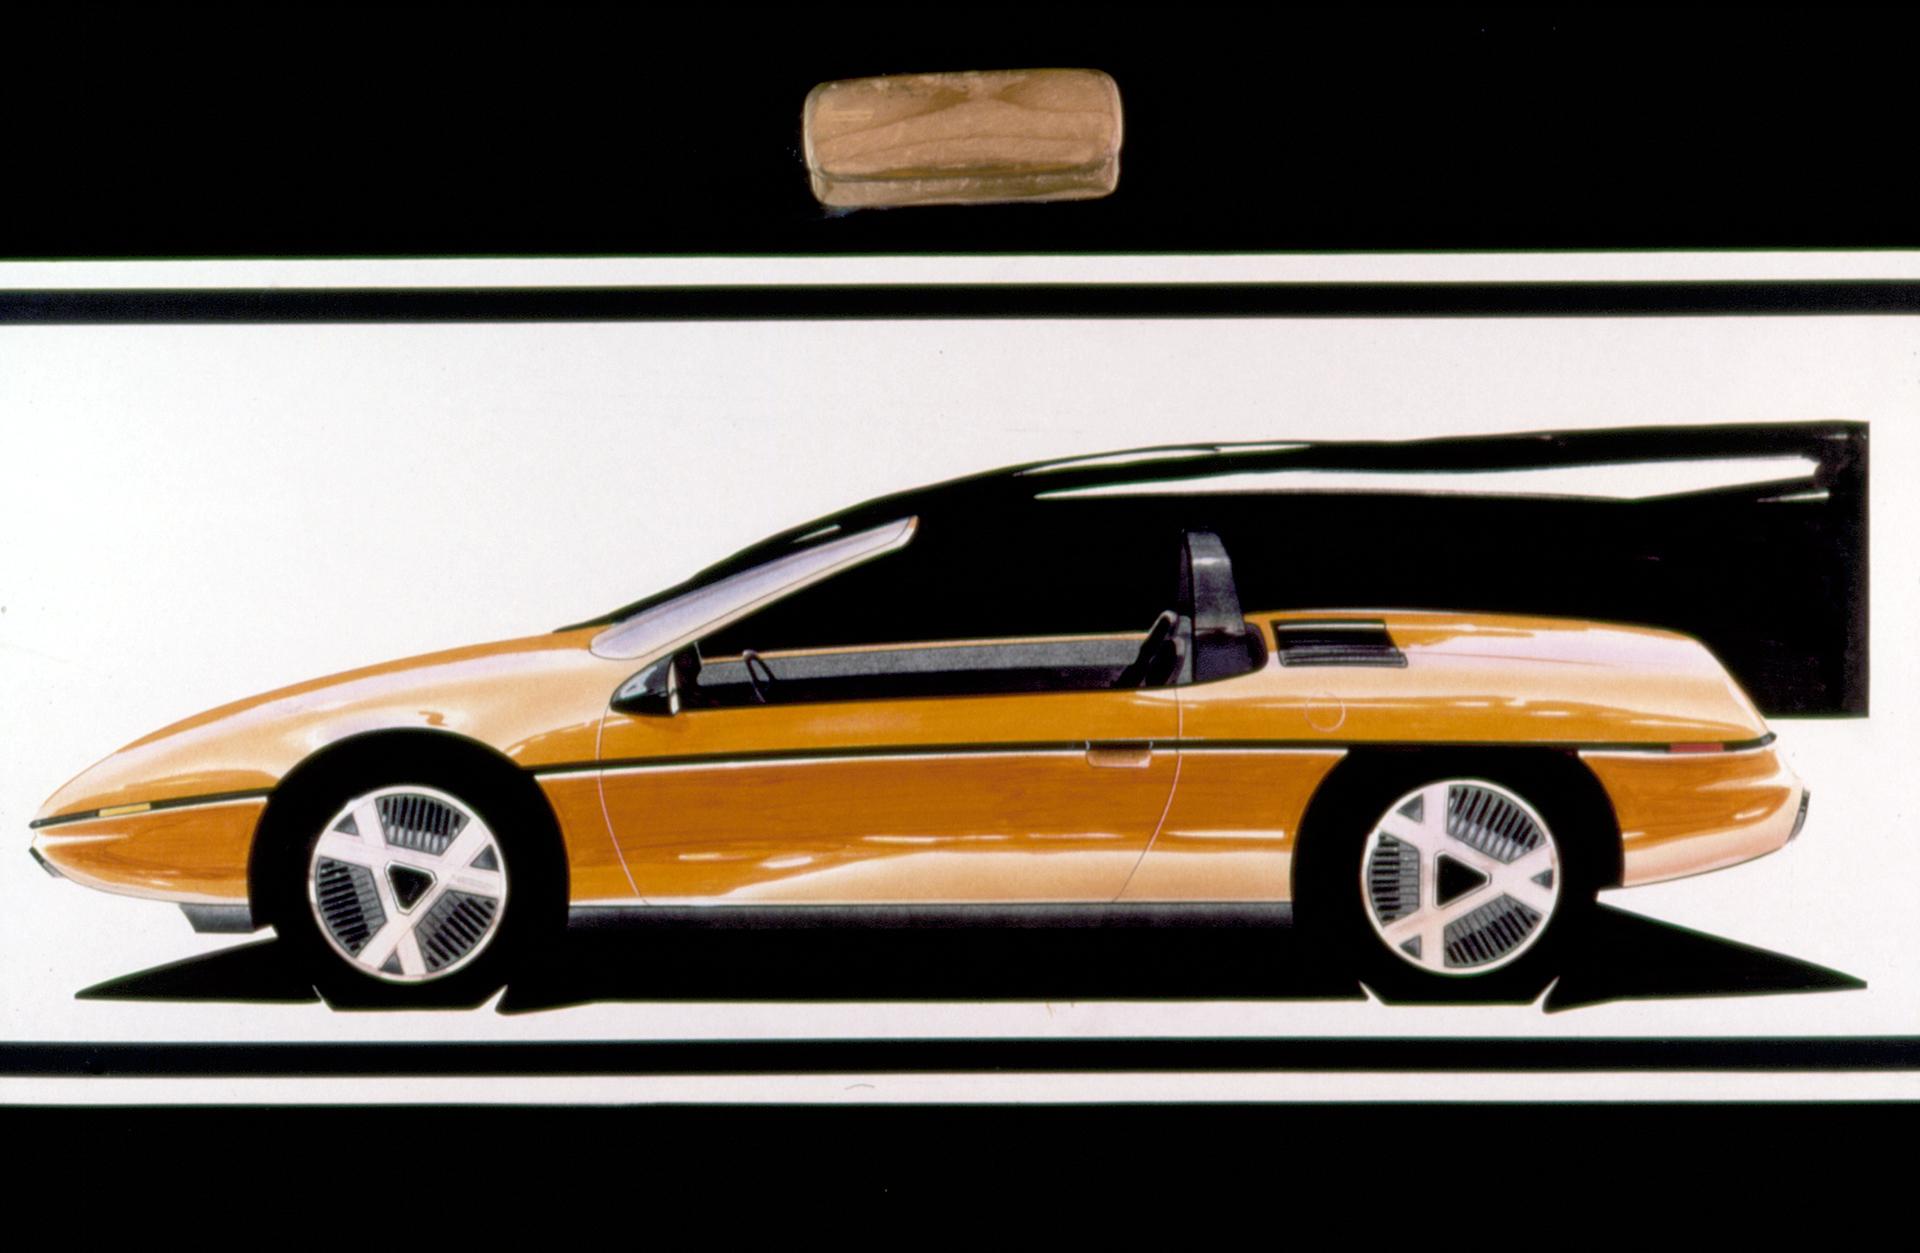 1985 Pontiac Fiero Design Sketch